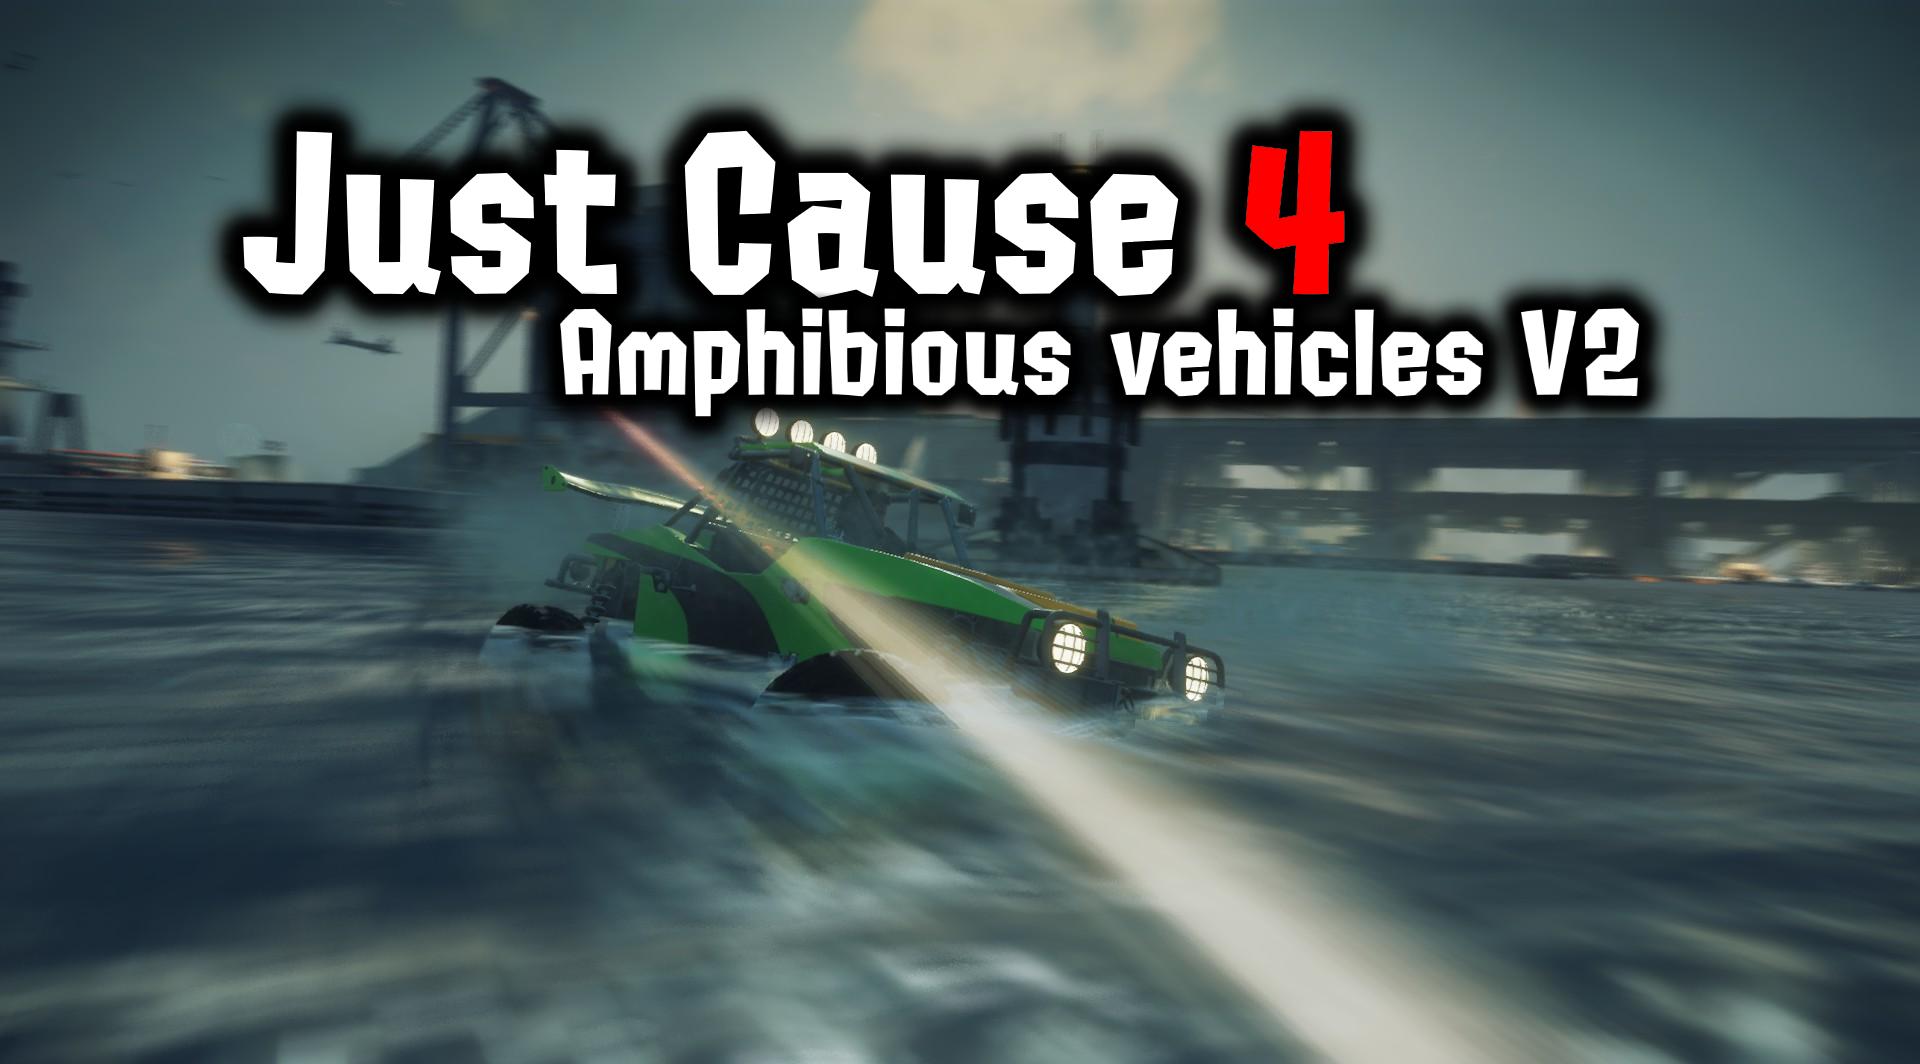 Amphibious vehicles V2